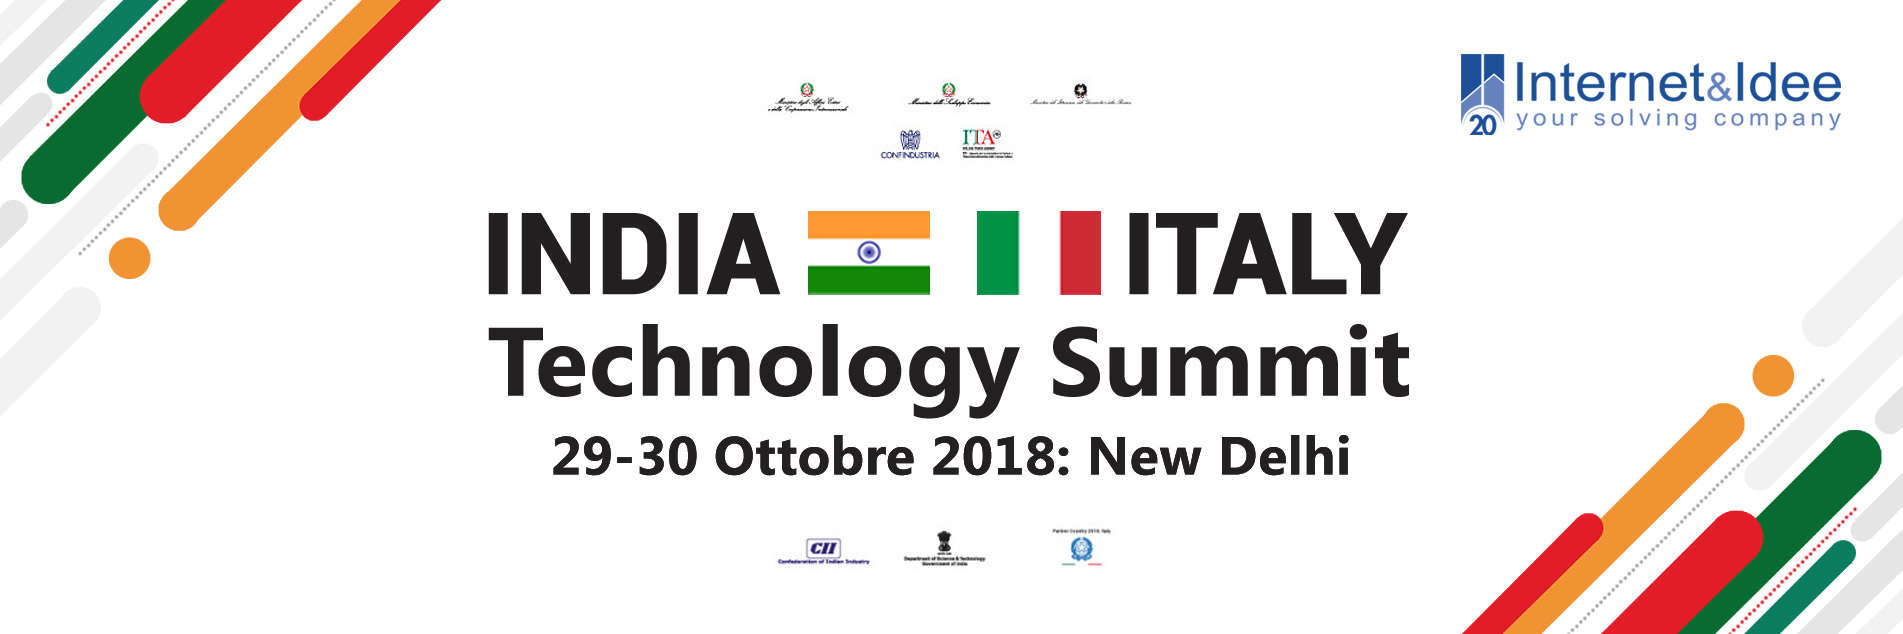 Internet & Idee parteciperà all'India-Italy Technology Summit - New Delhi 29-30 ottobre 2018